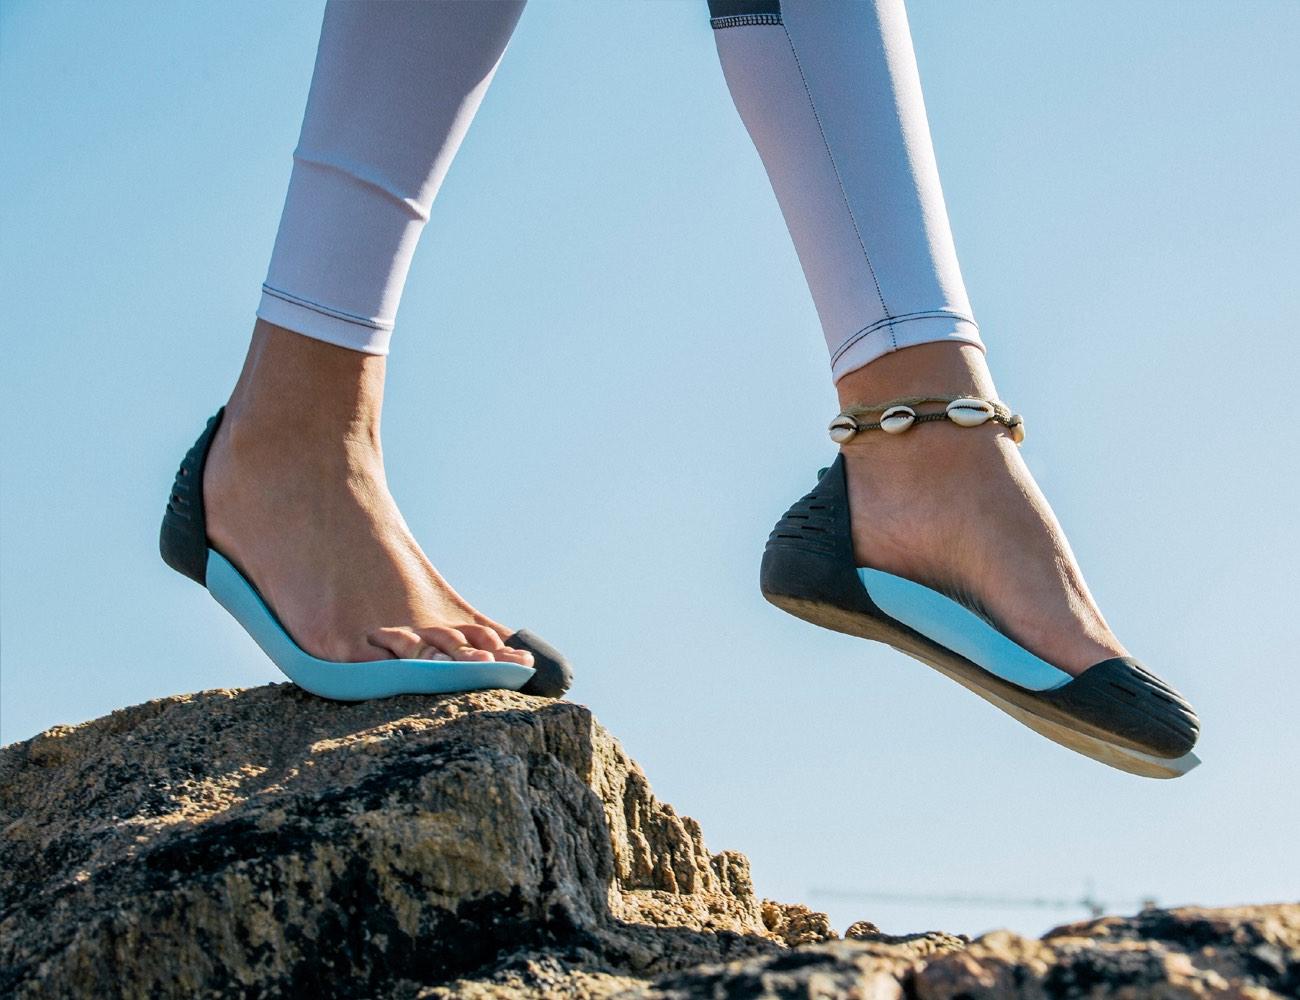 Baredfoot Toe Shoes